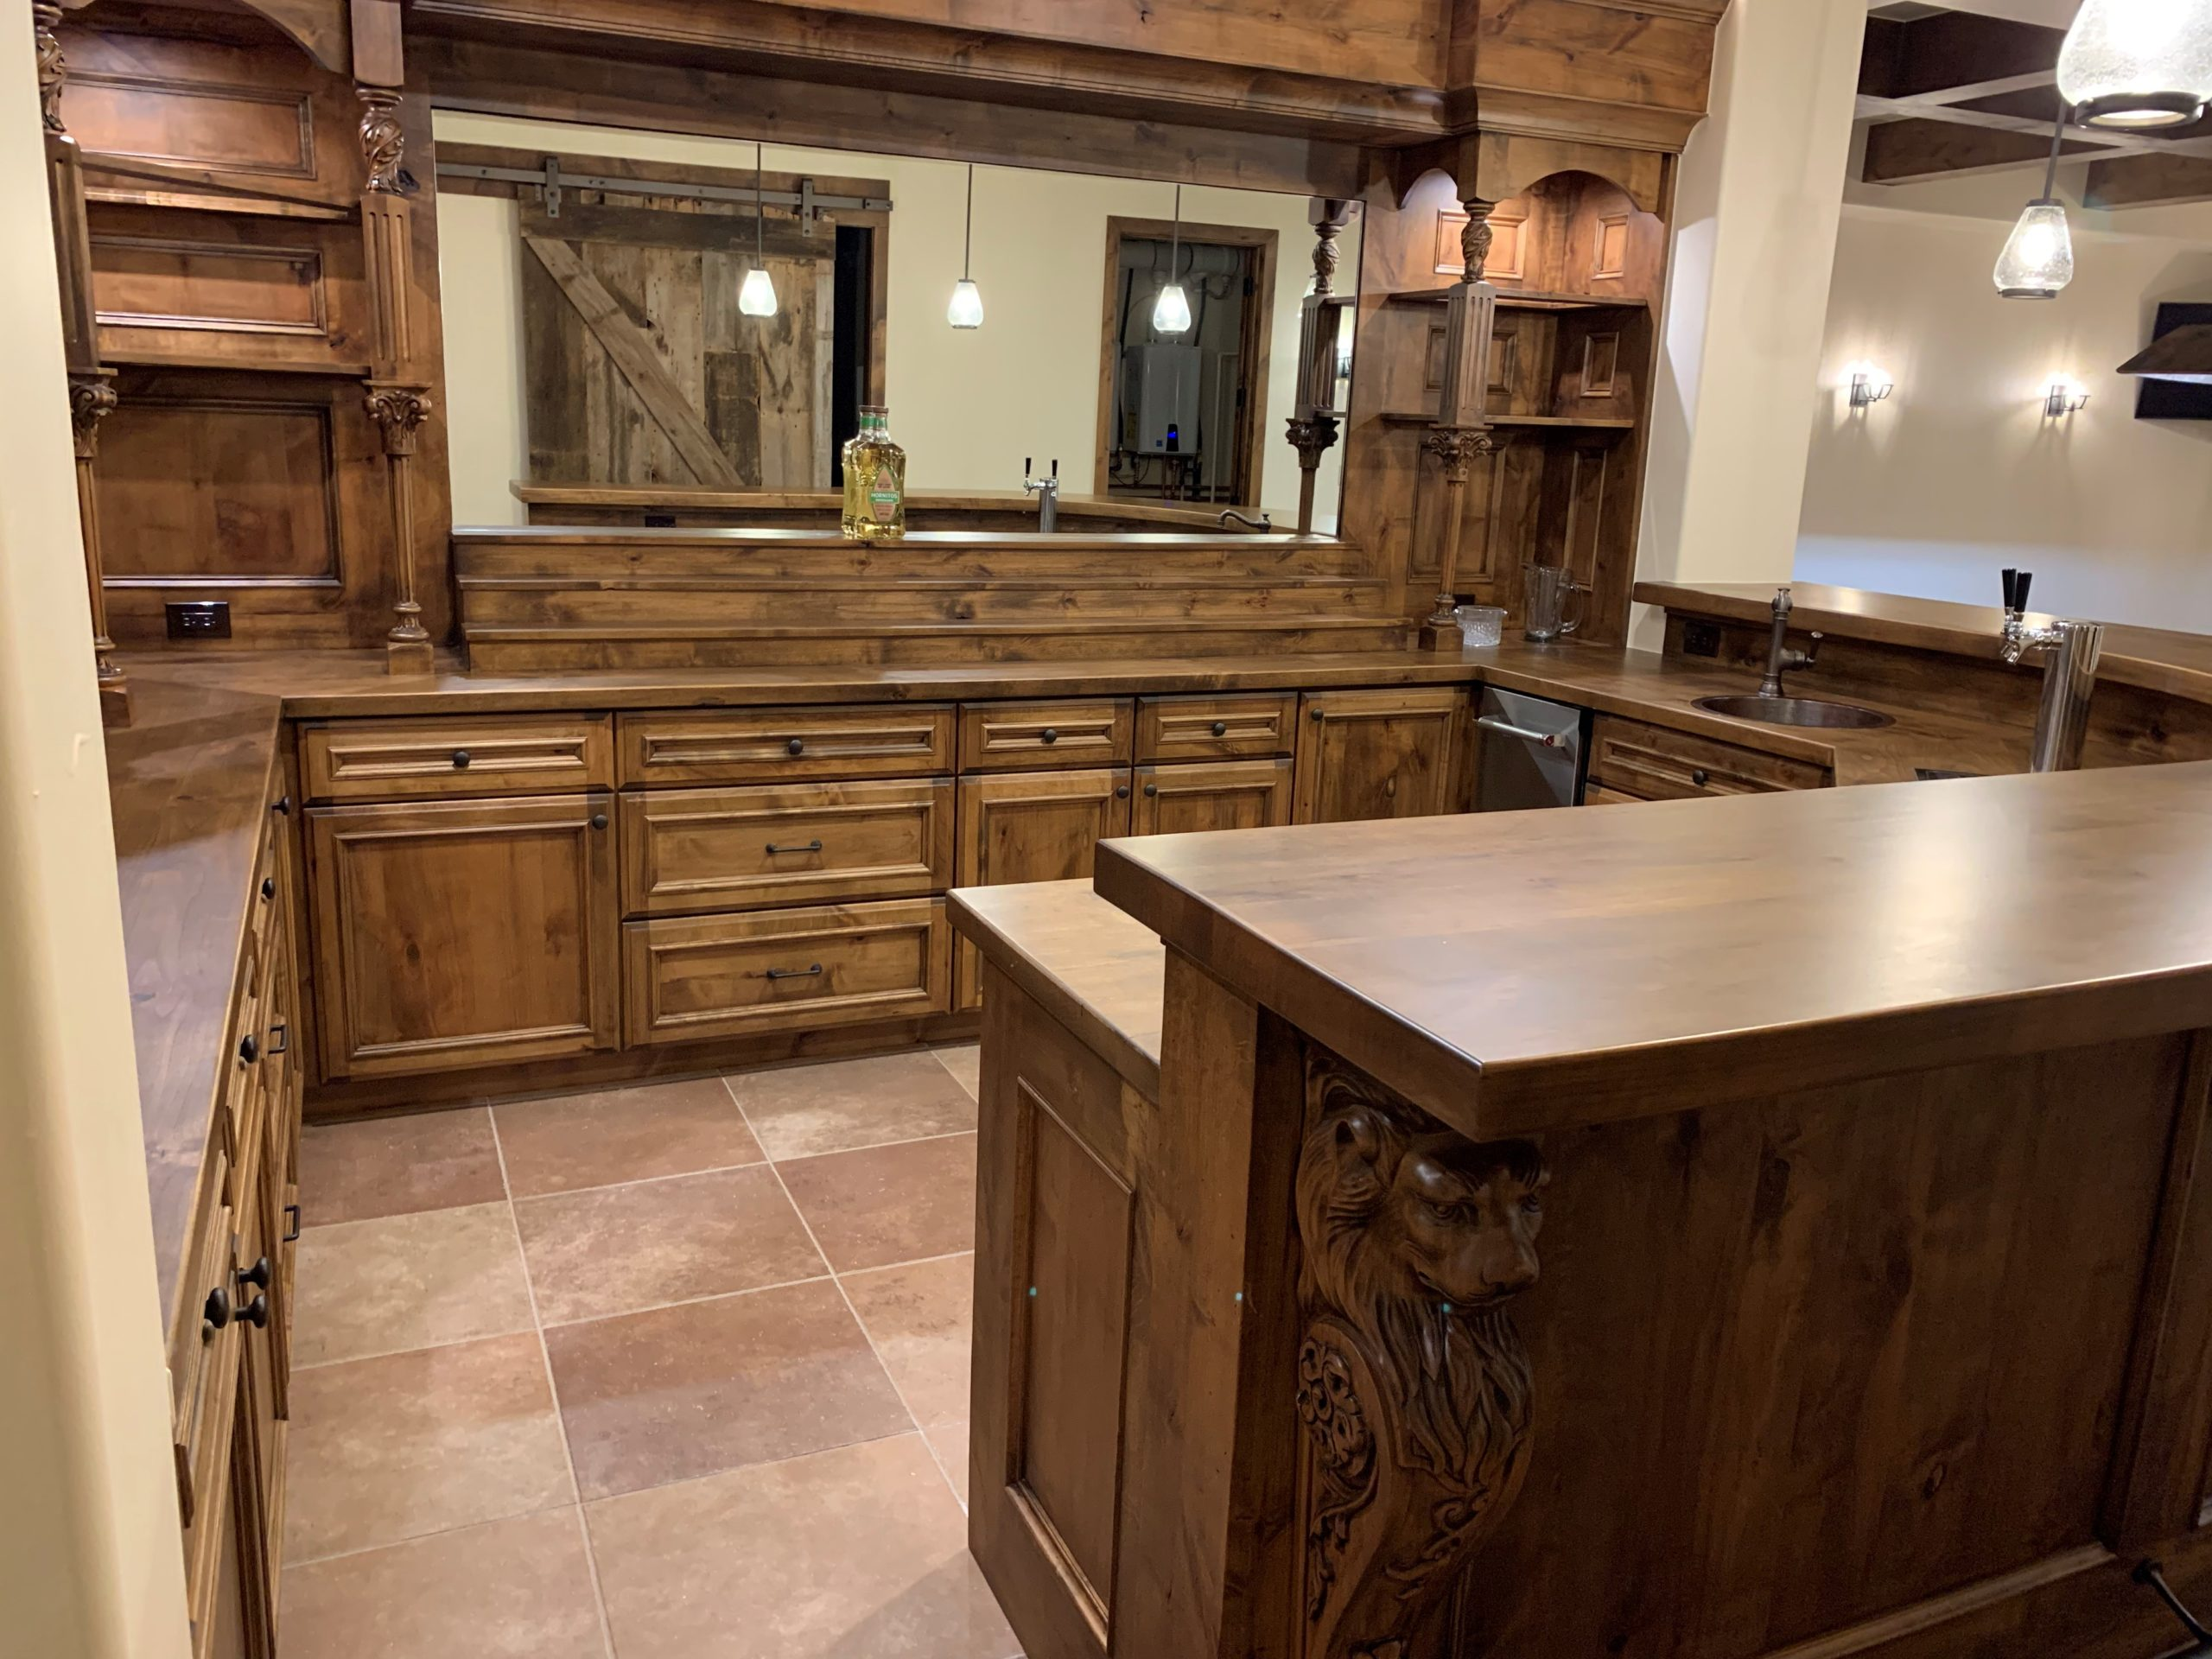 cabinets 4